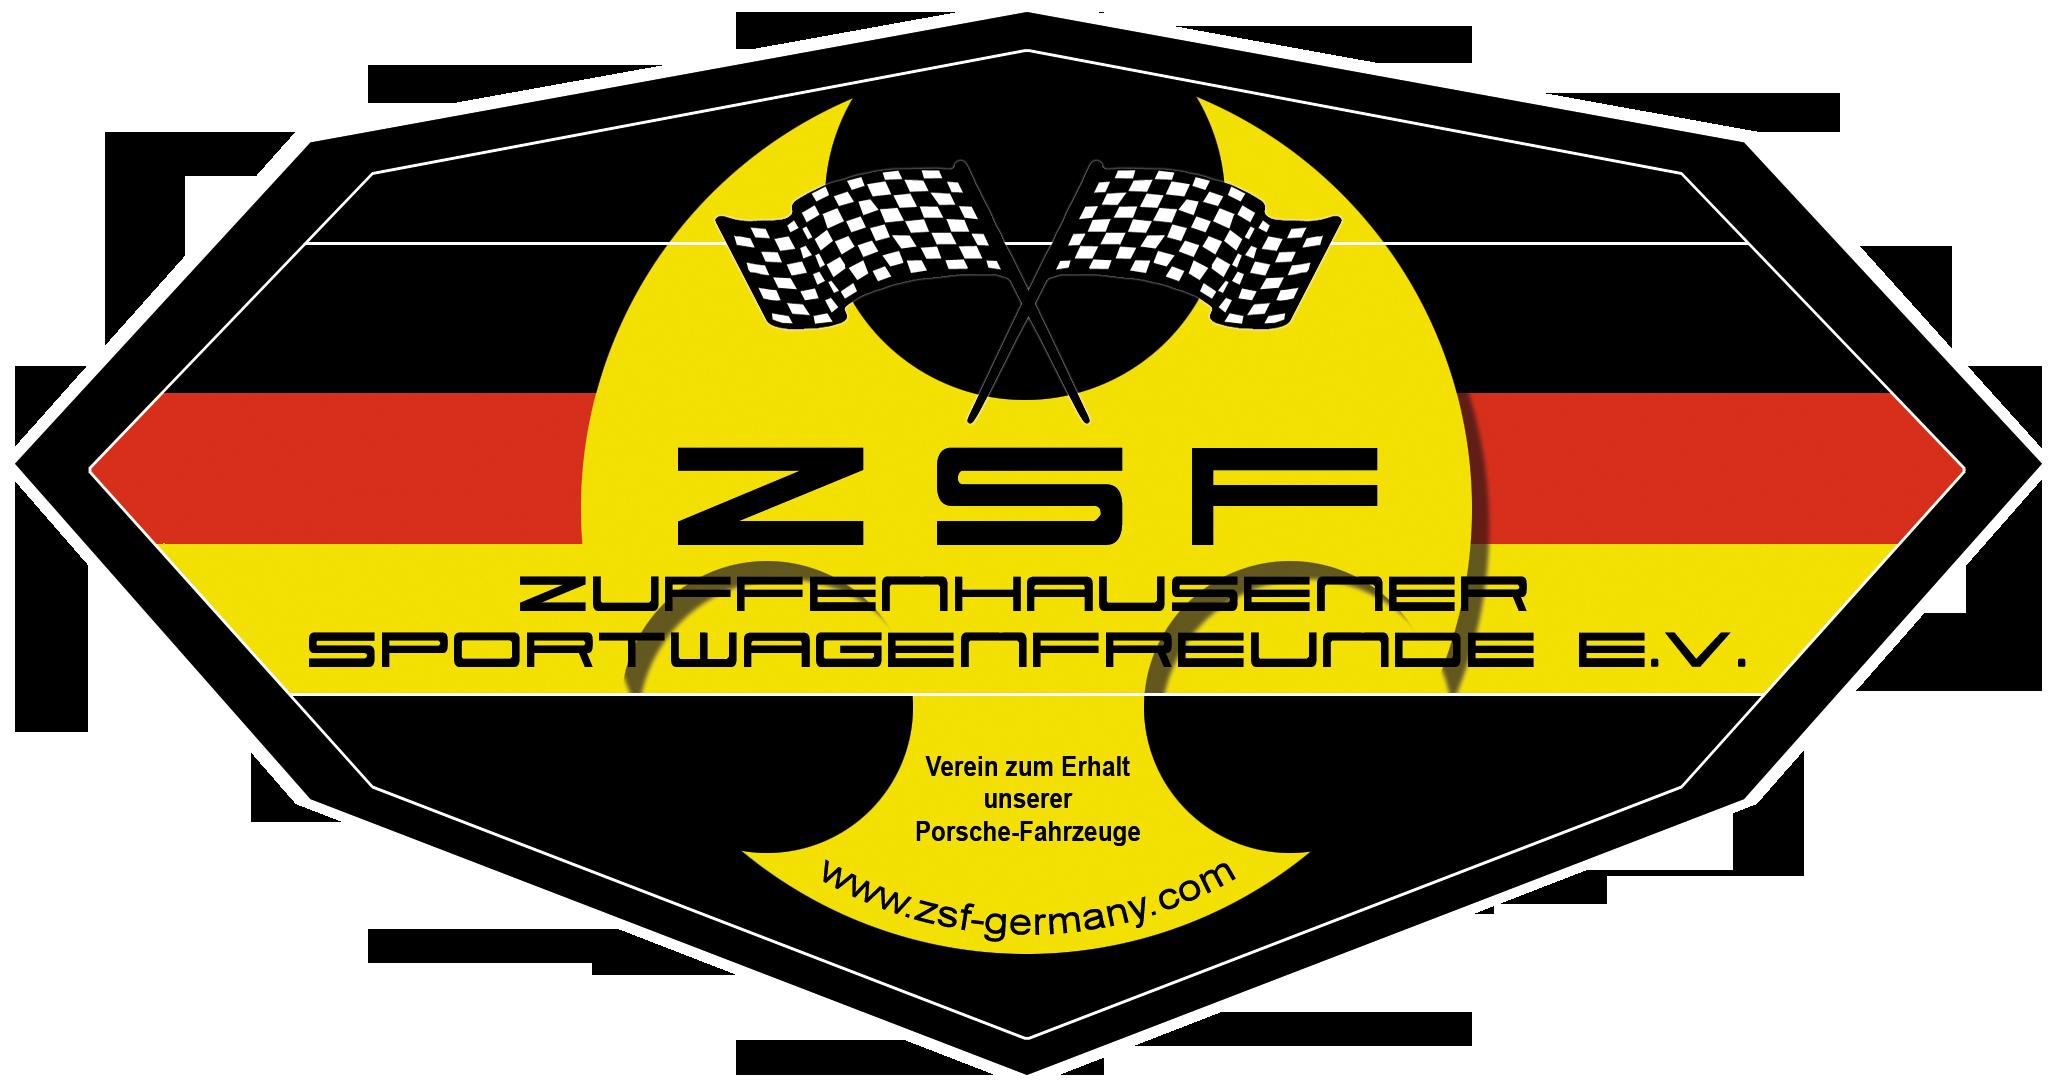 ZSF Zuffenhausener-Sportwagenfreunde e.V.